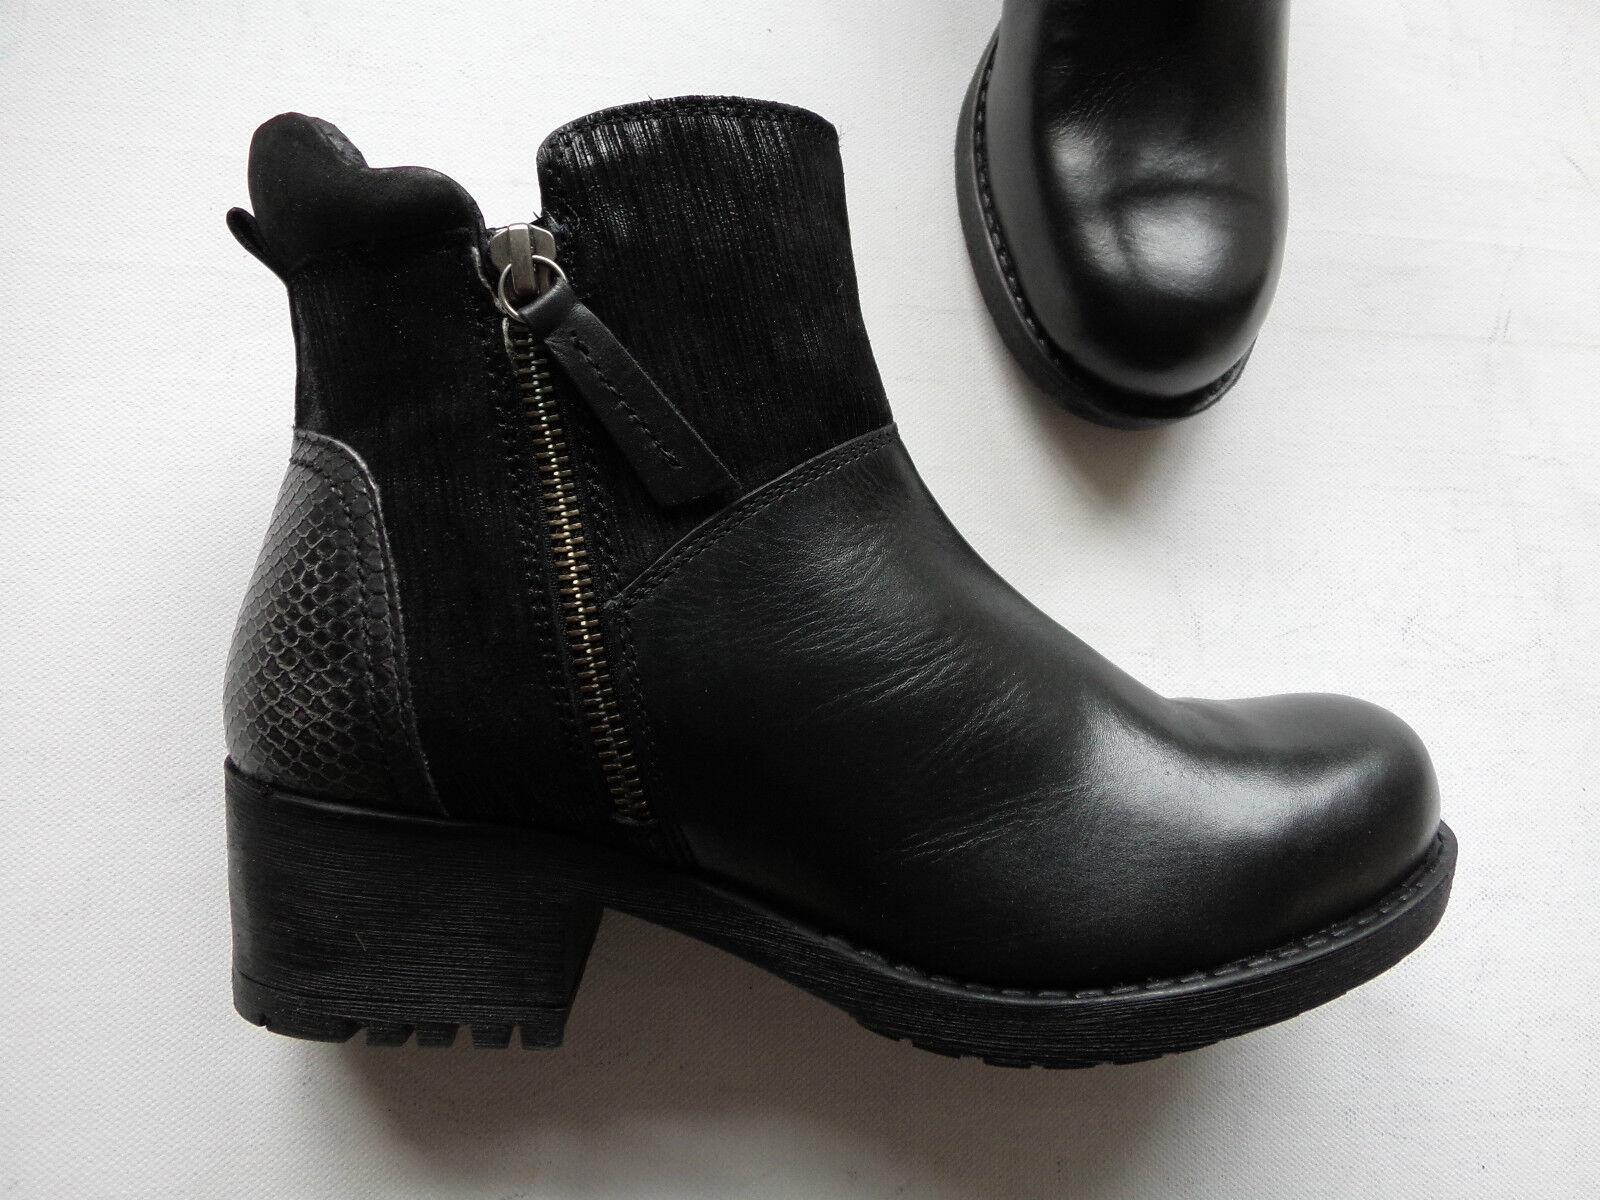 NEU noir Ankle bottes bottesette echt Leder mit Reißverschluss noir Gr.37-42